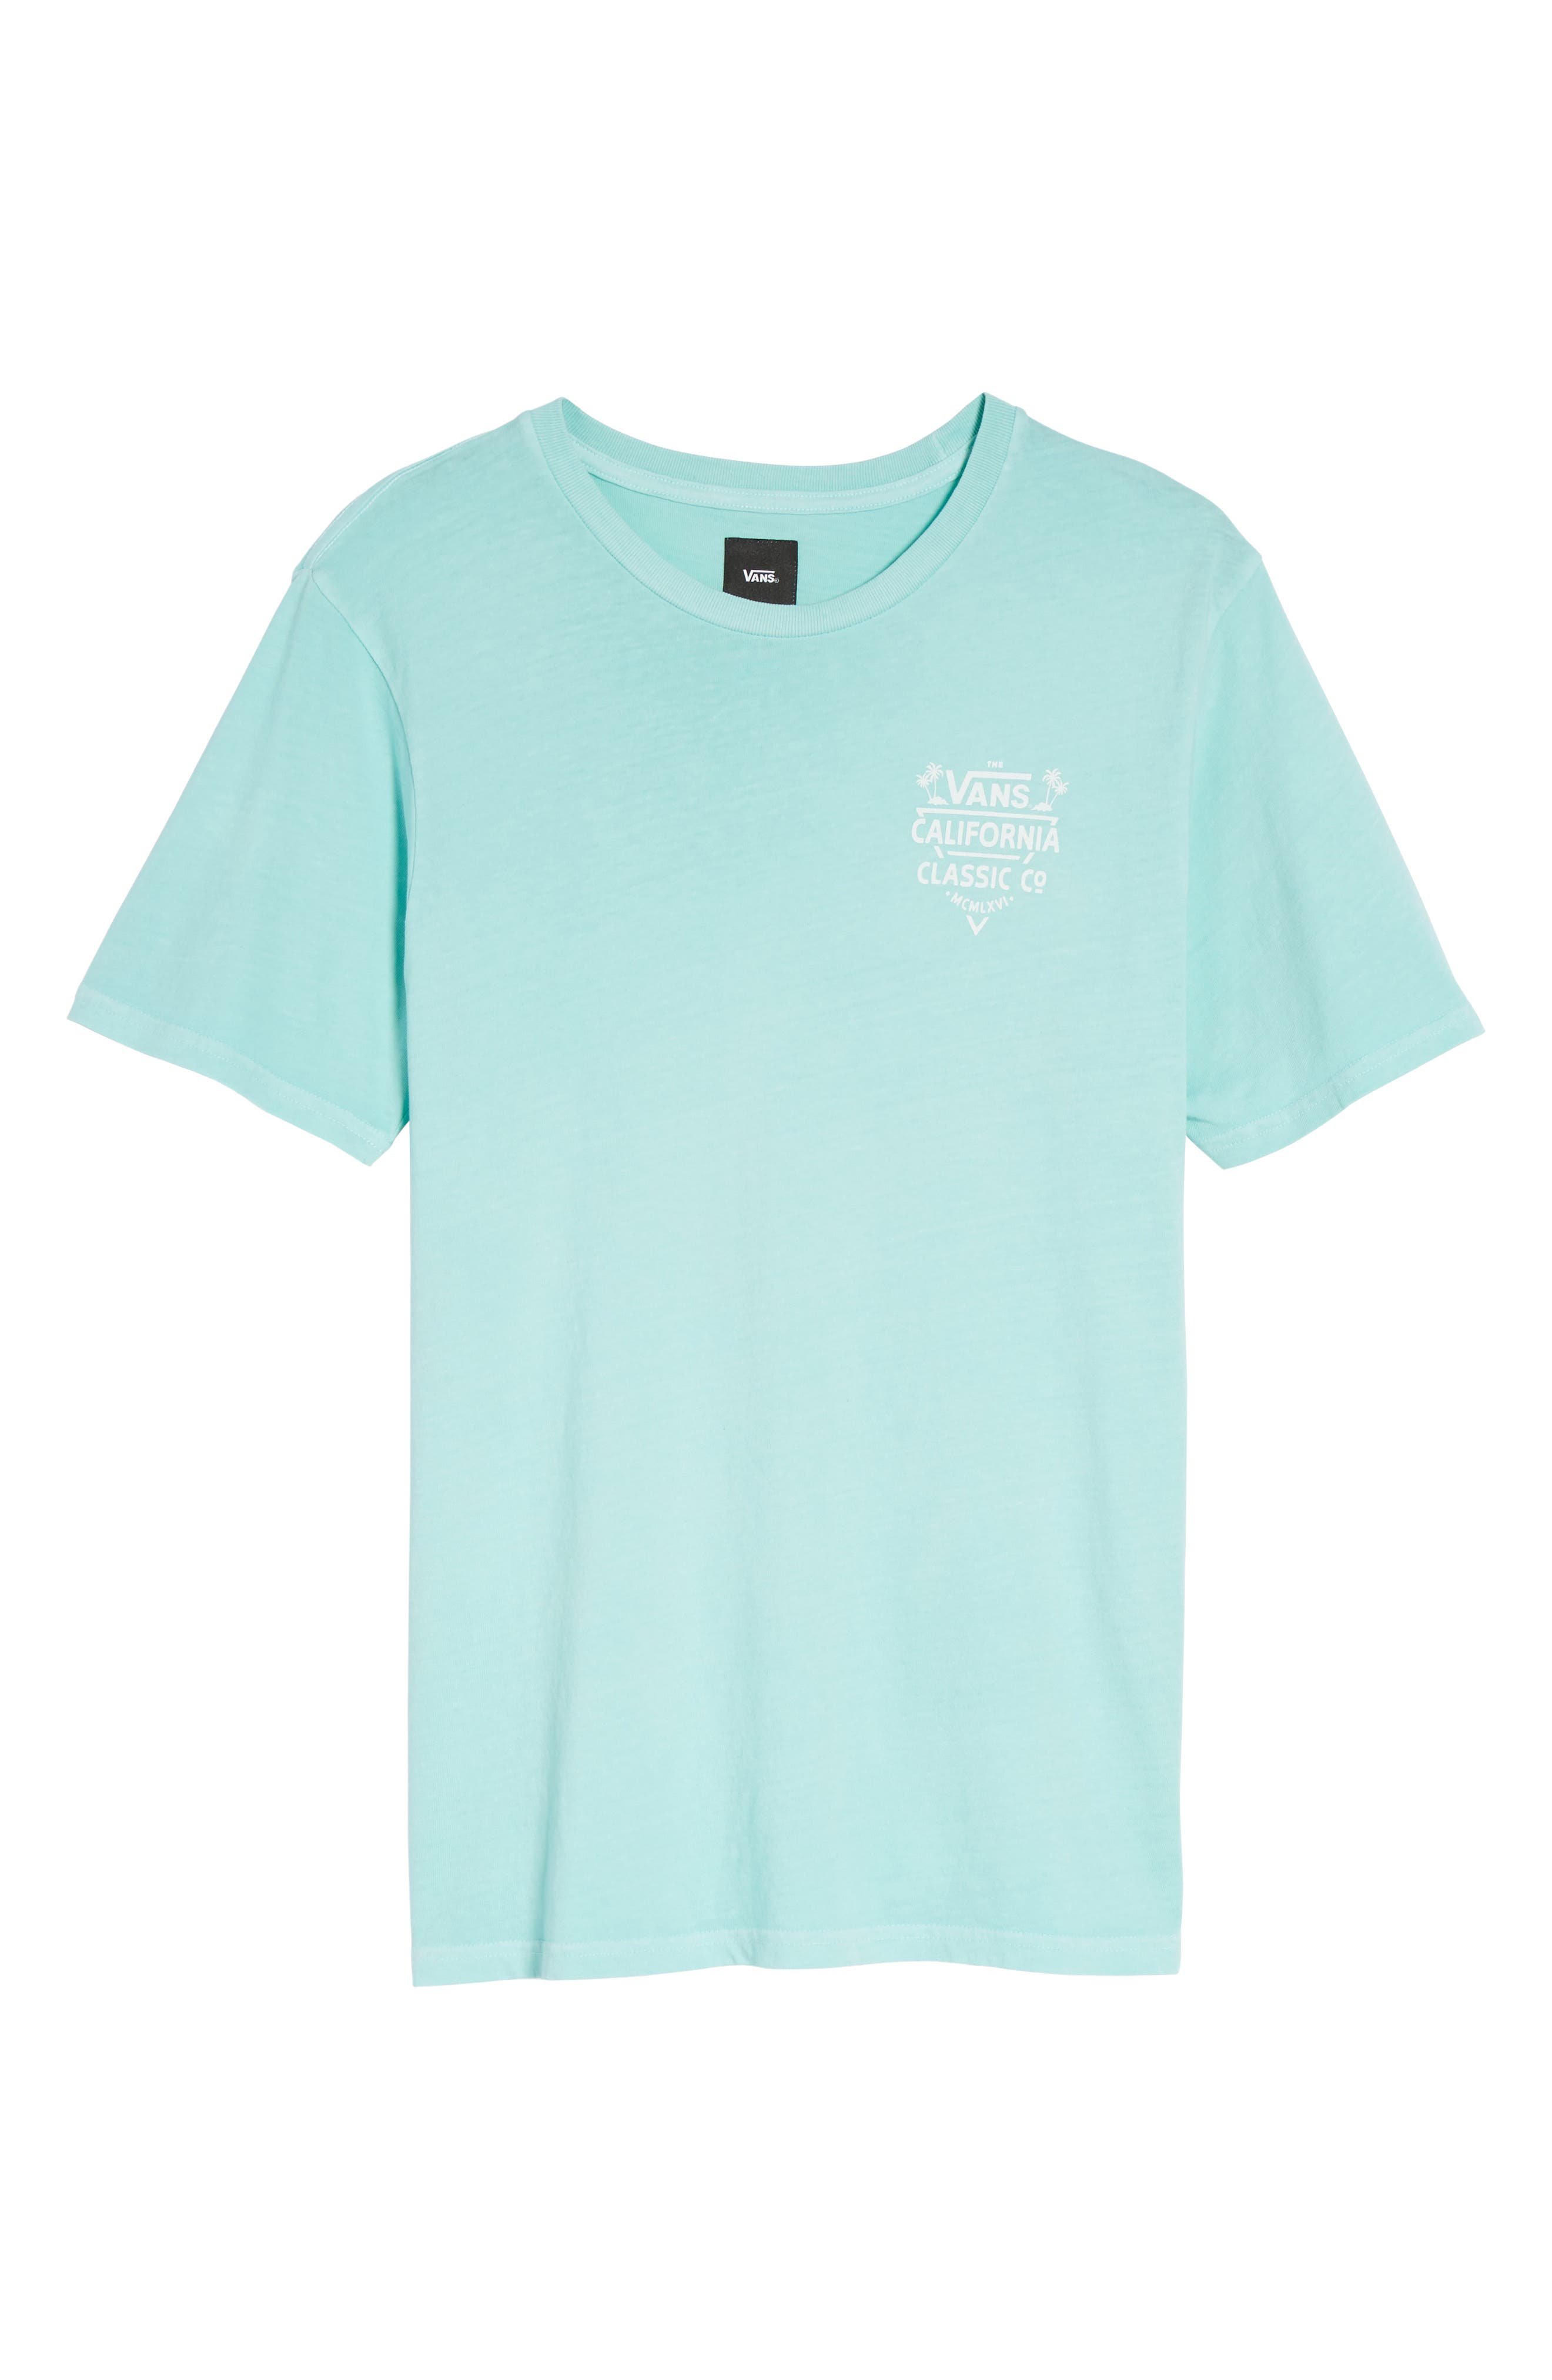 California Classic Co. Overdye T-Shirt,                             Alternate thumbnail 6, color,                             400